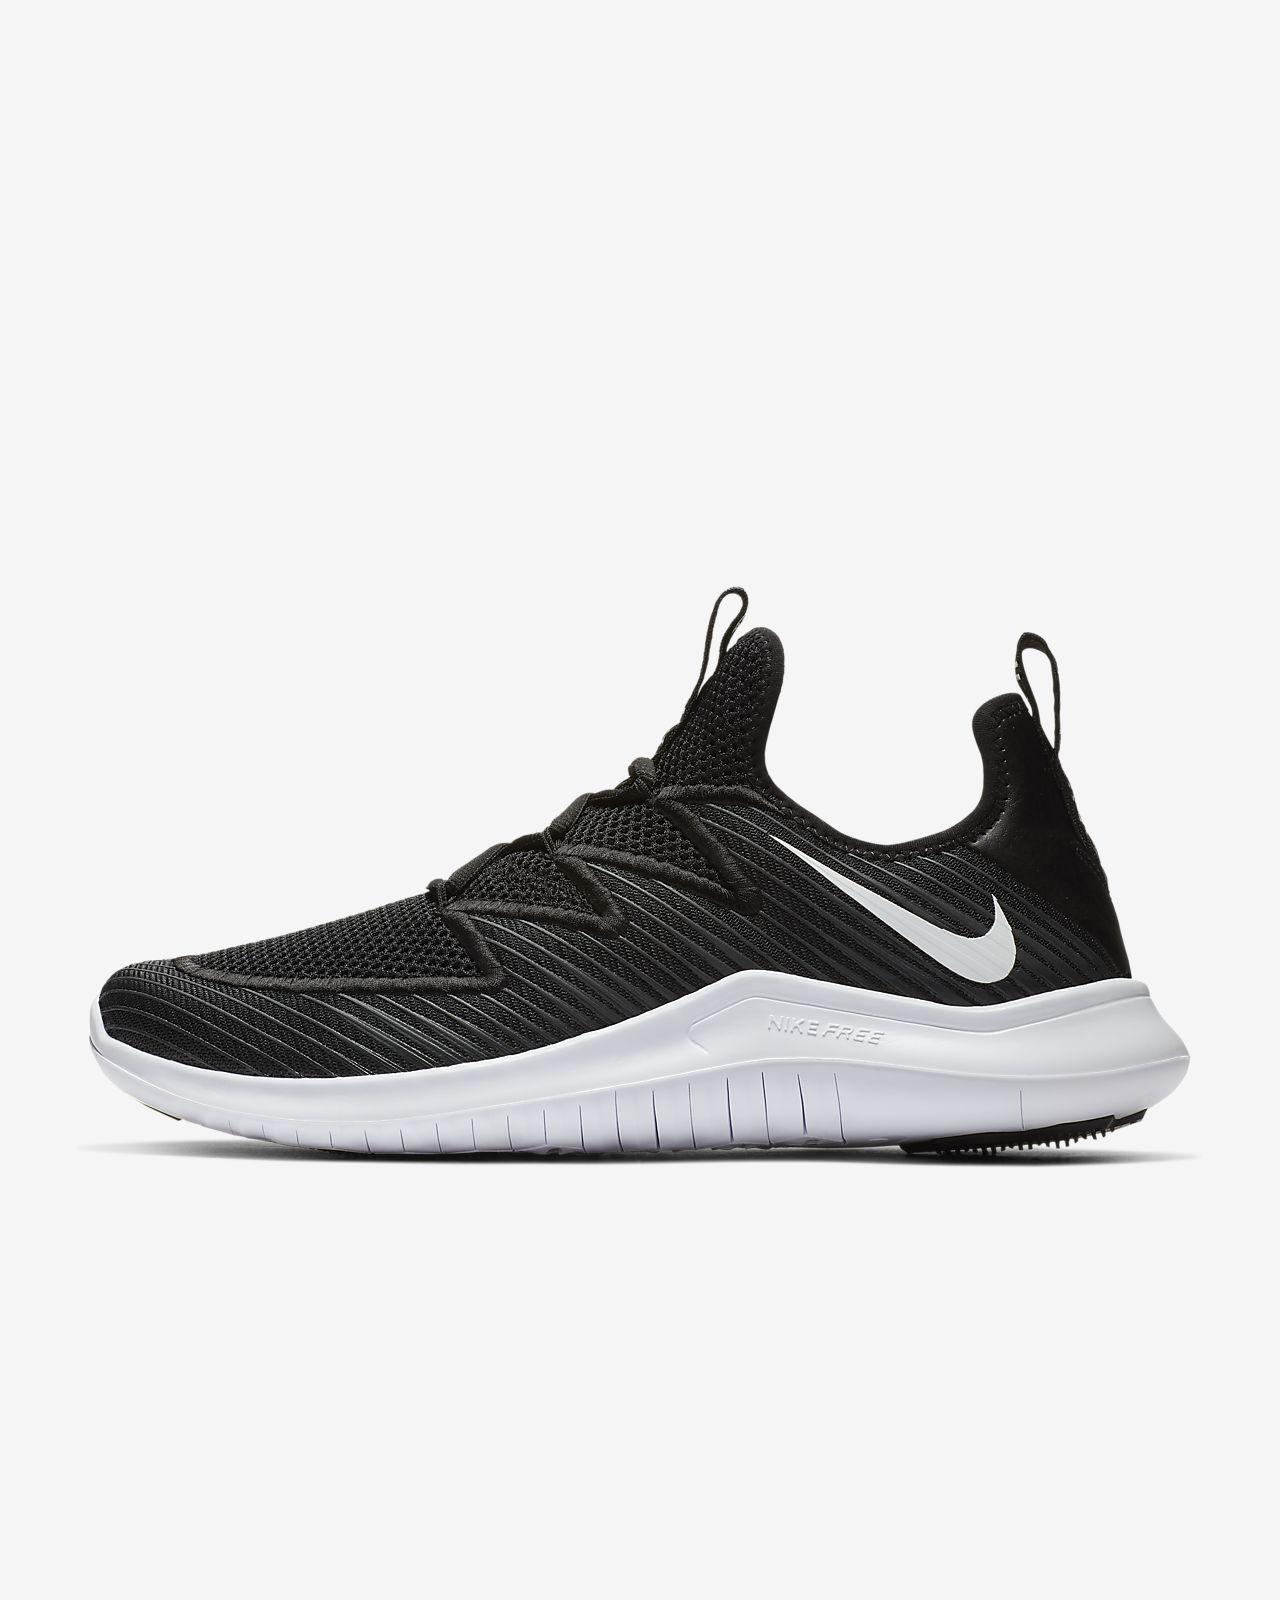 Calzado de entrenamiento para hombre Nike Free TR 9 Ultra